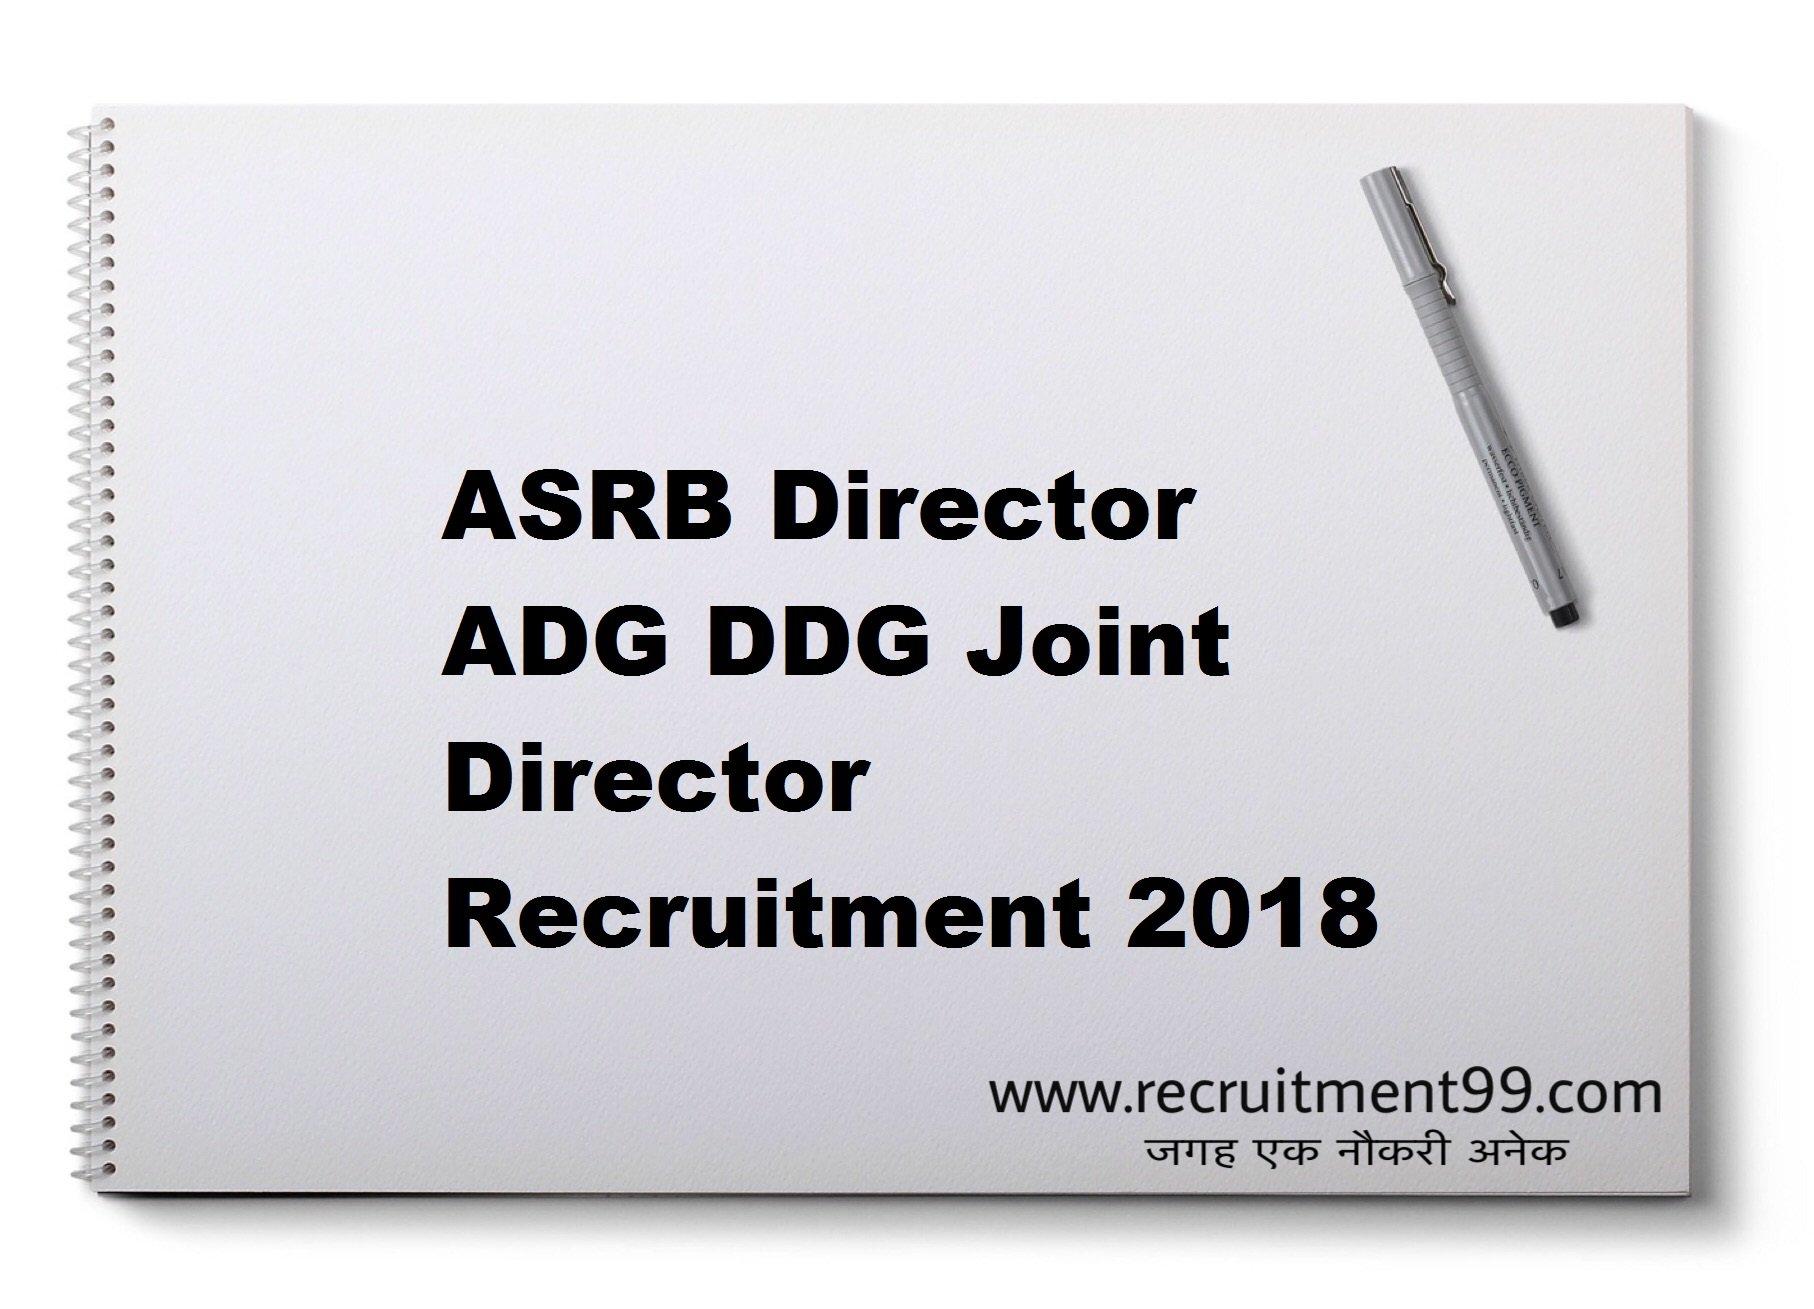 ASRB Director ADG DDG Joint Director Recruitment Admit Card Result 2018